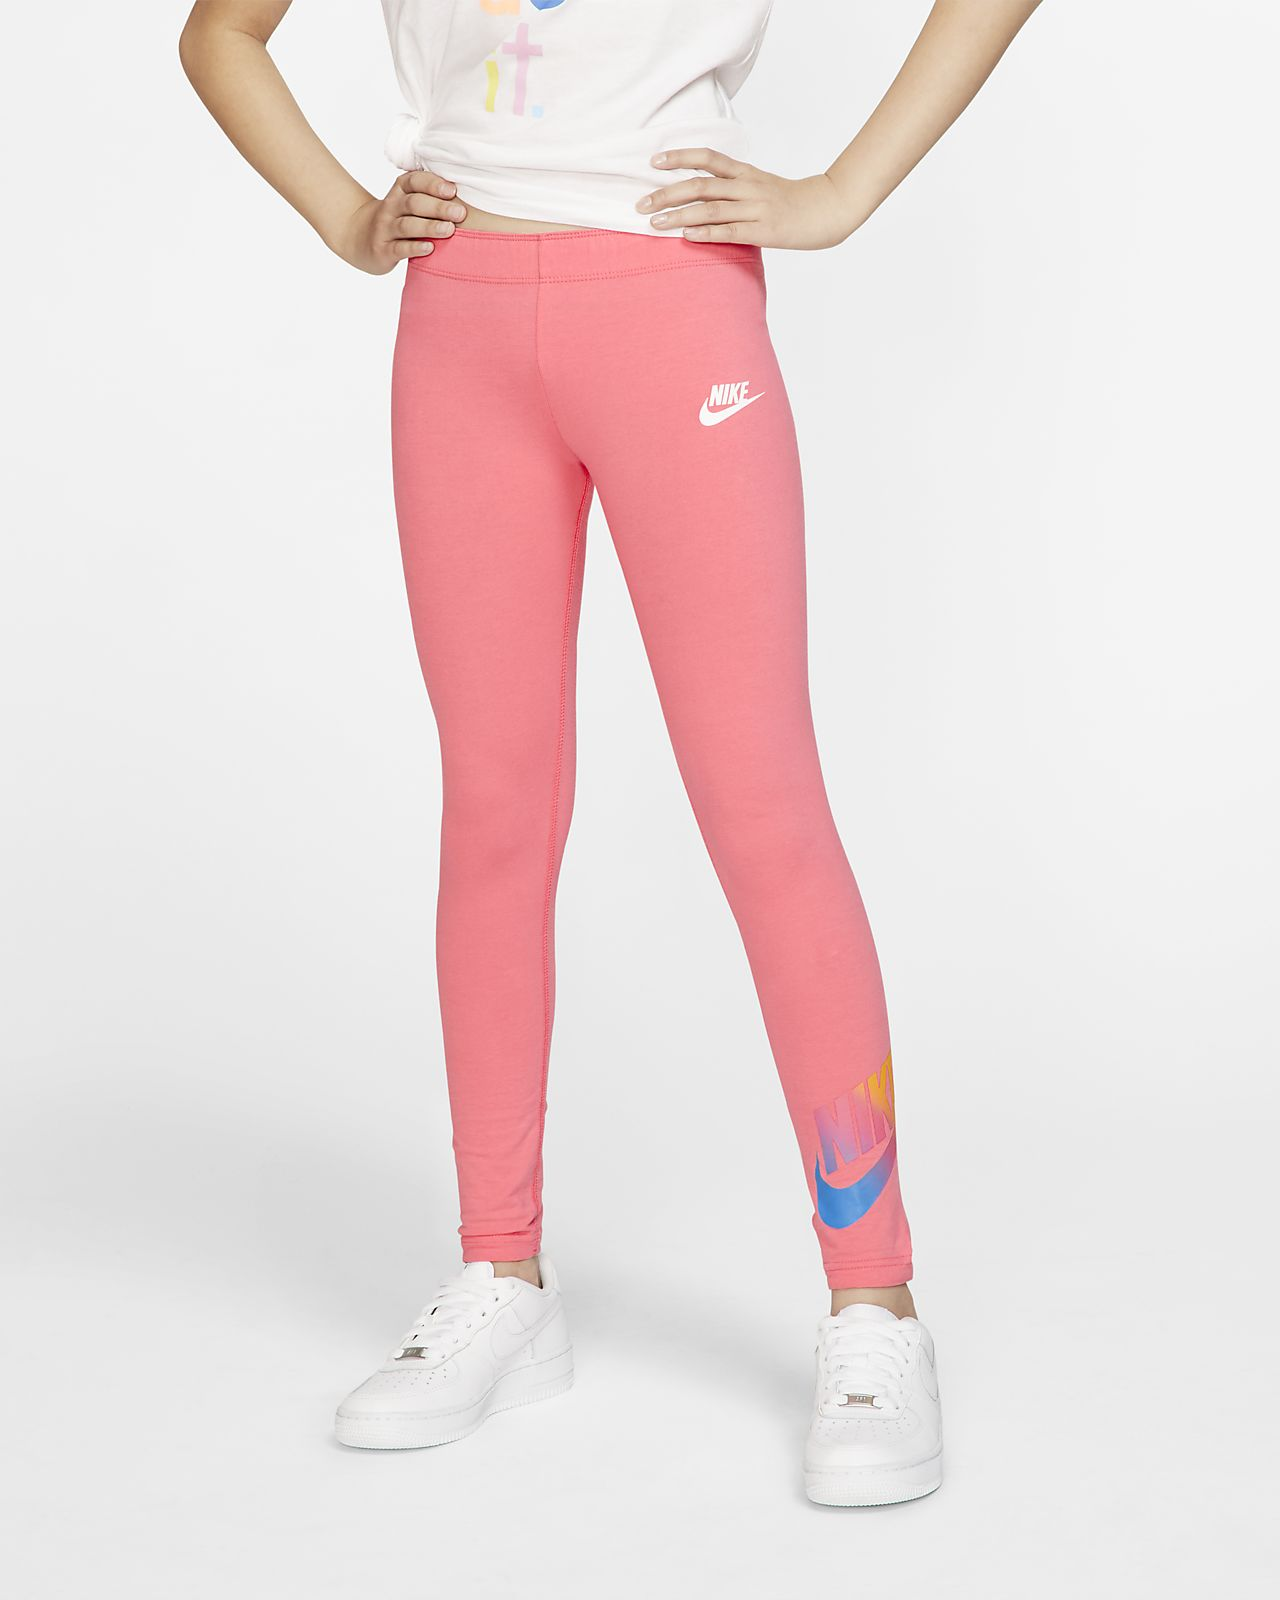 Nike Sportswear 大童(女孩)紧身裤